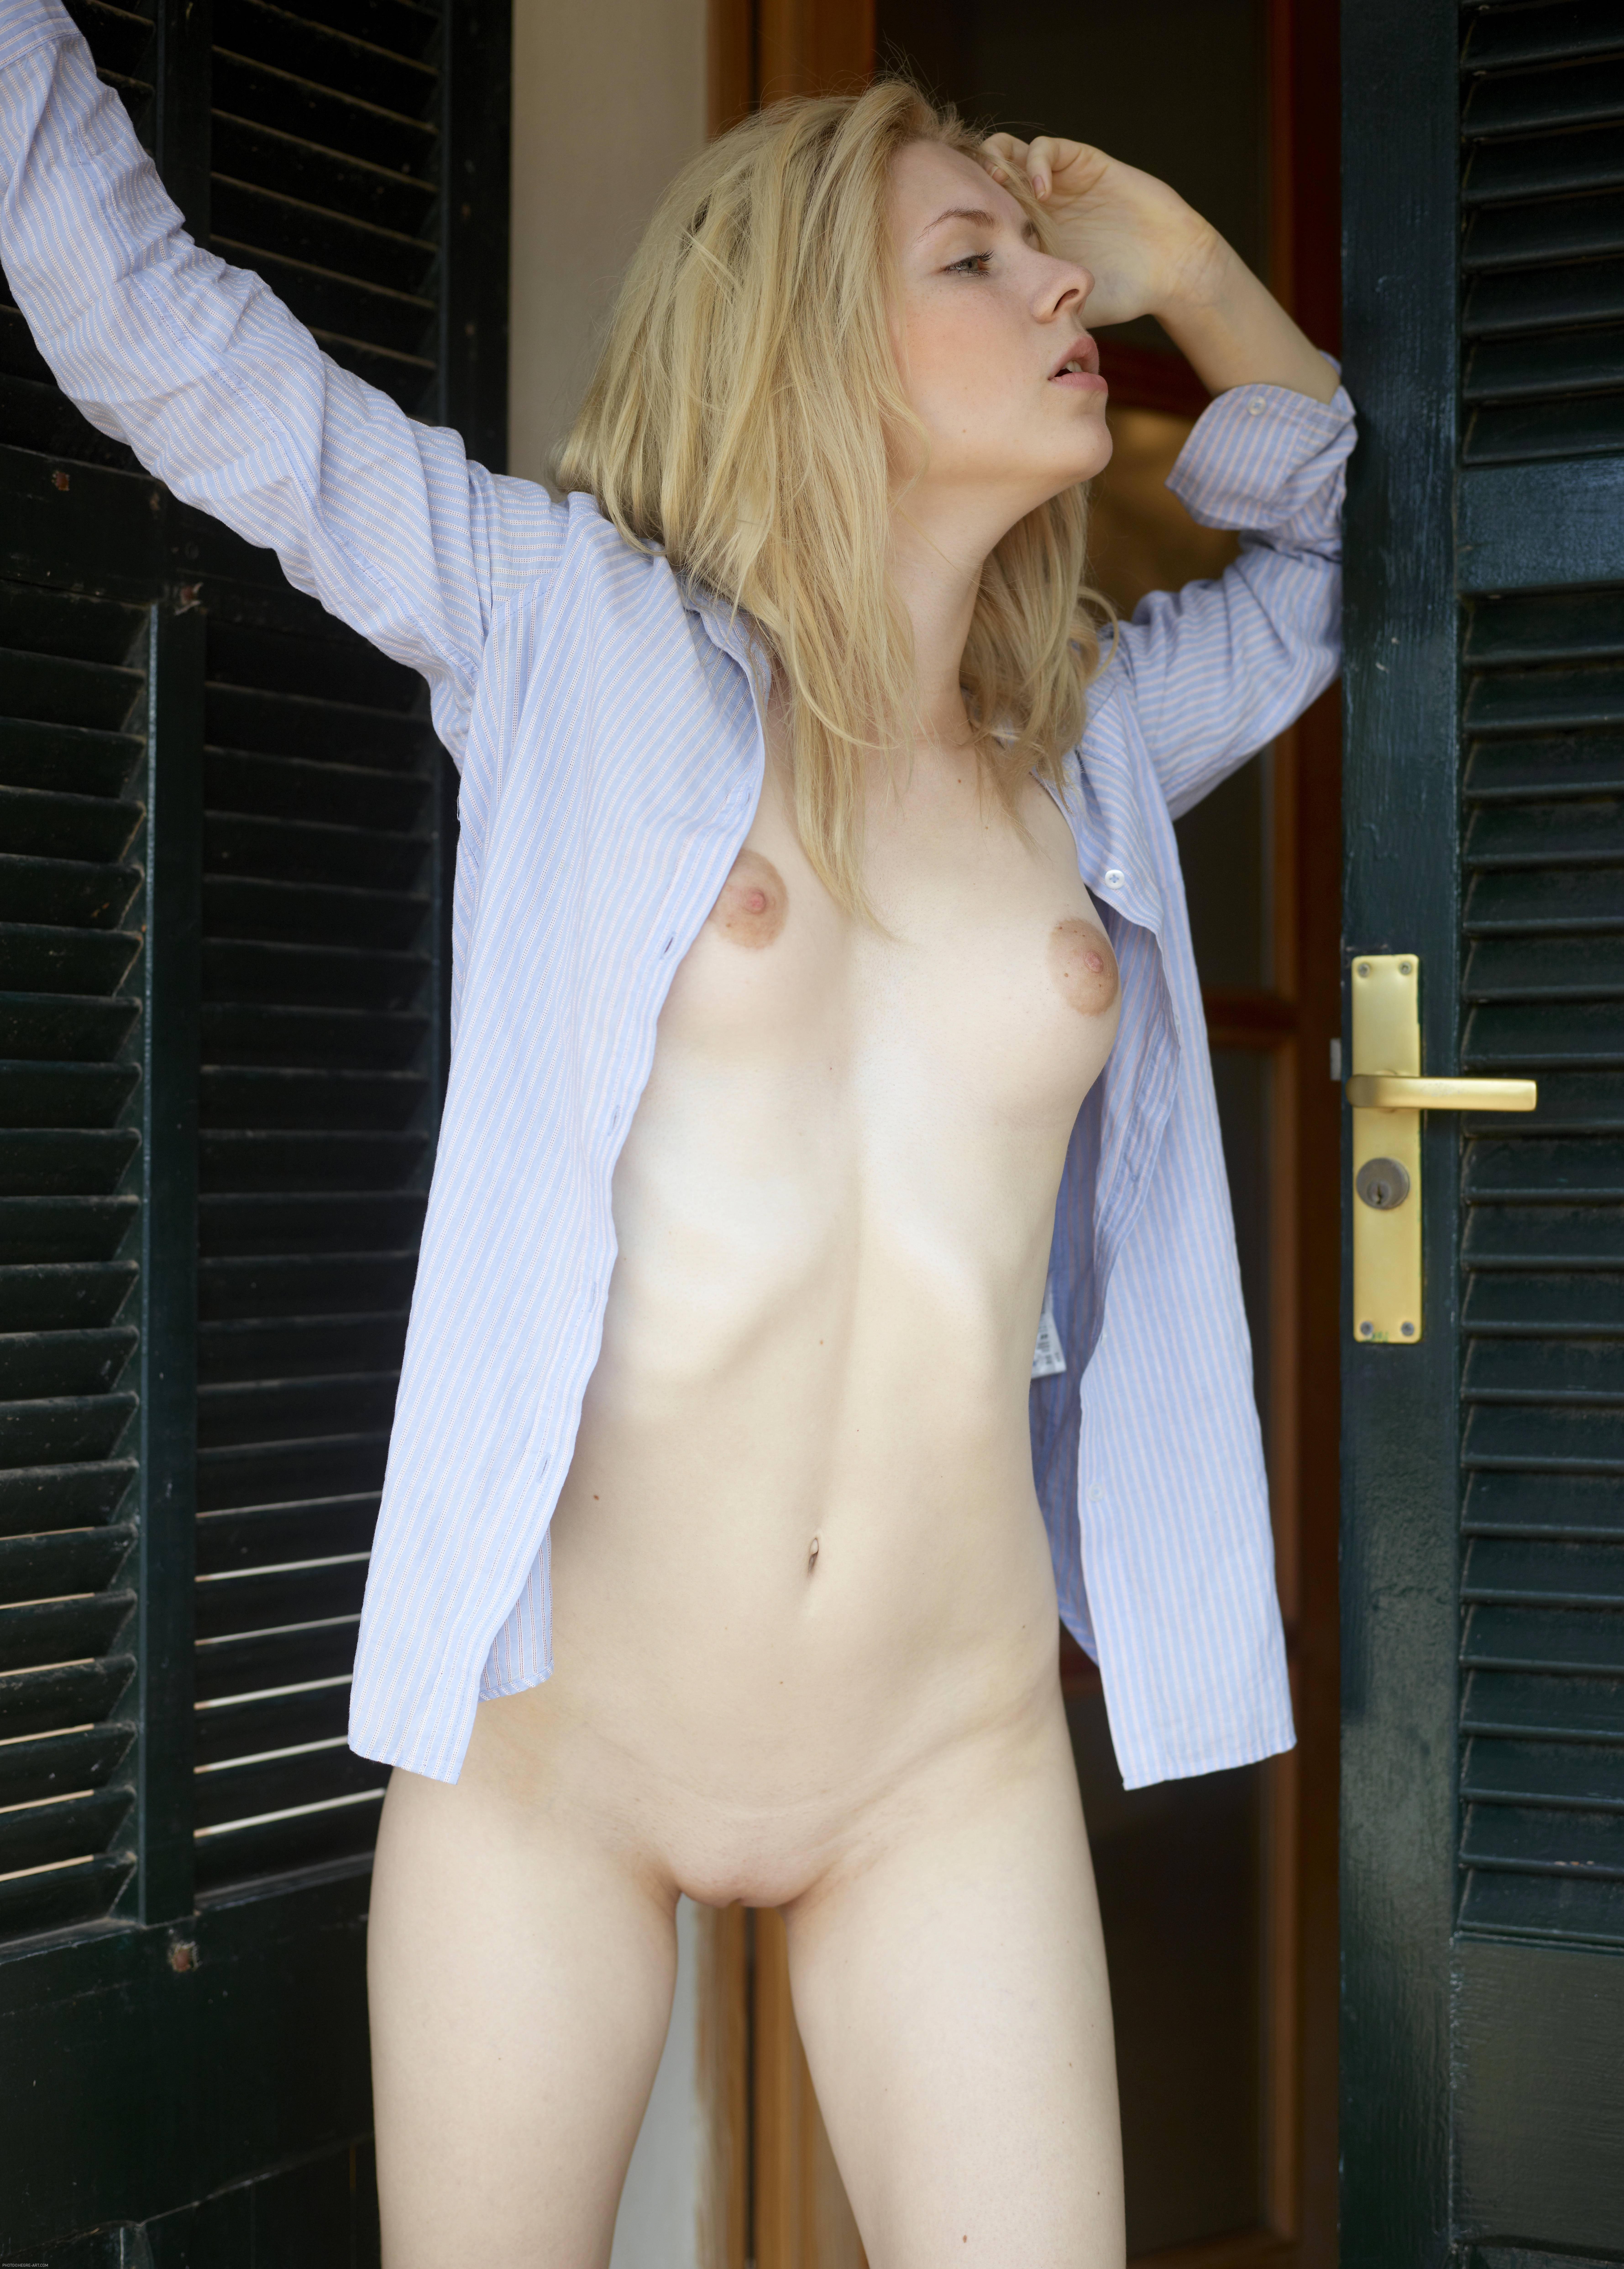 Very high resolution nude